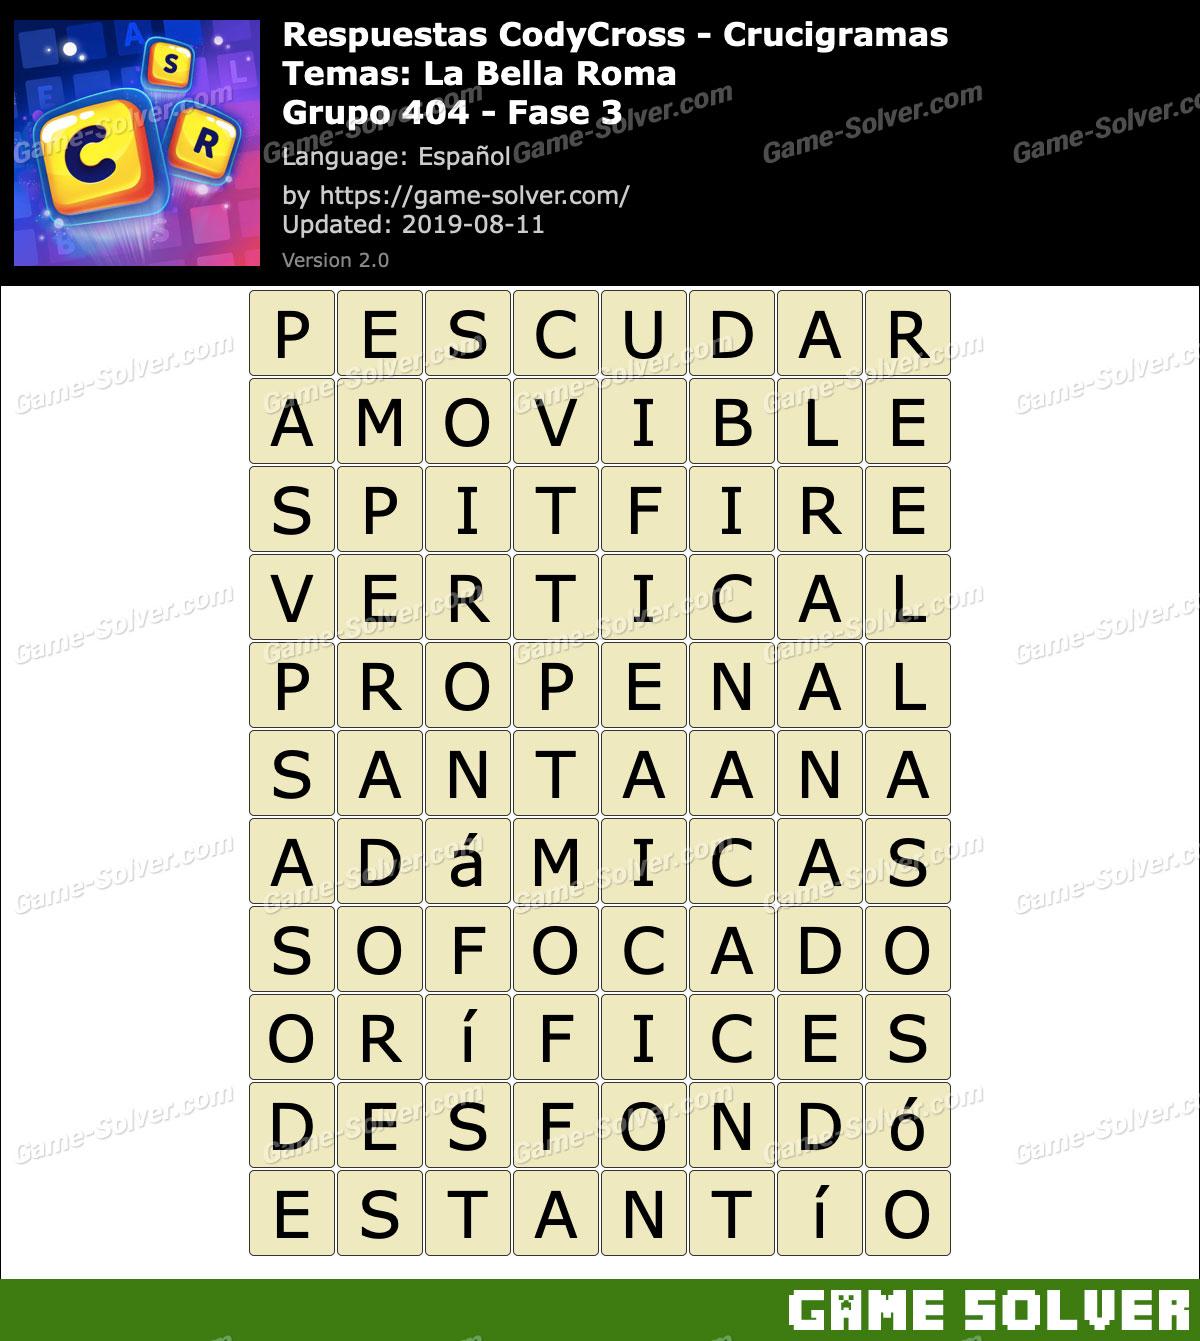 Respuestas CodyCross La Bella Roma Grupo 404-Fase 3